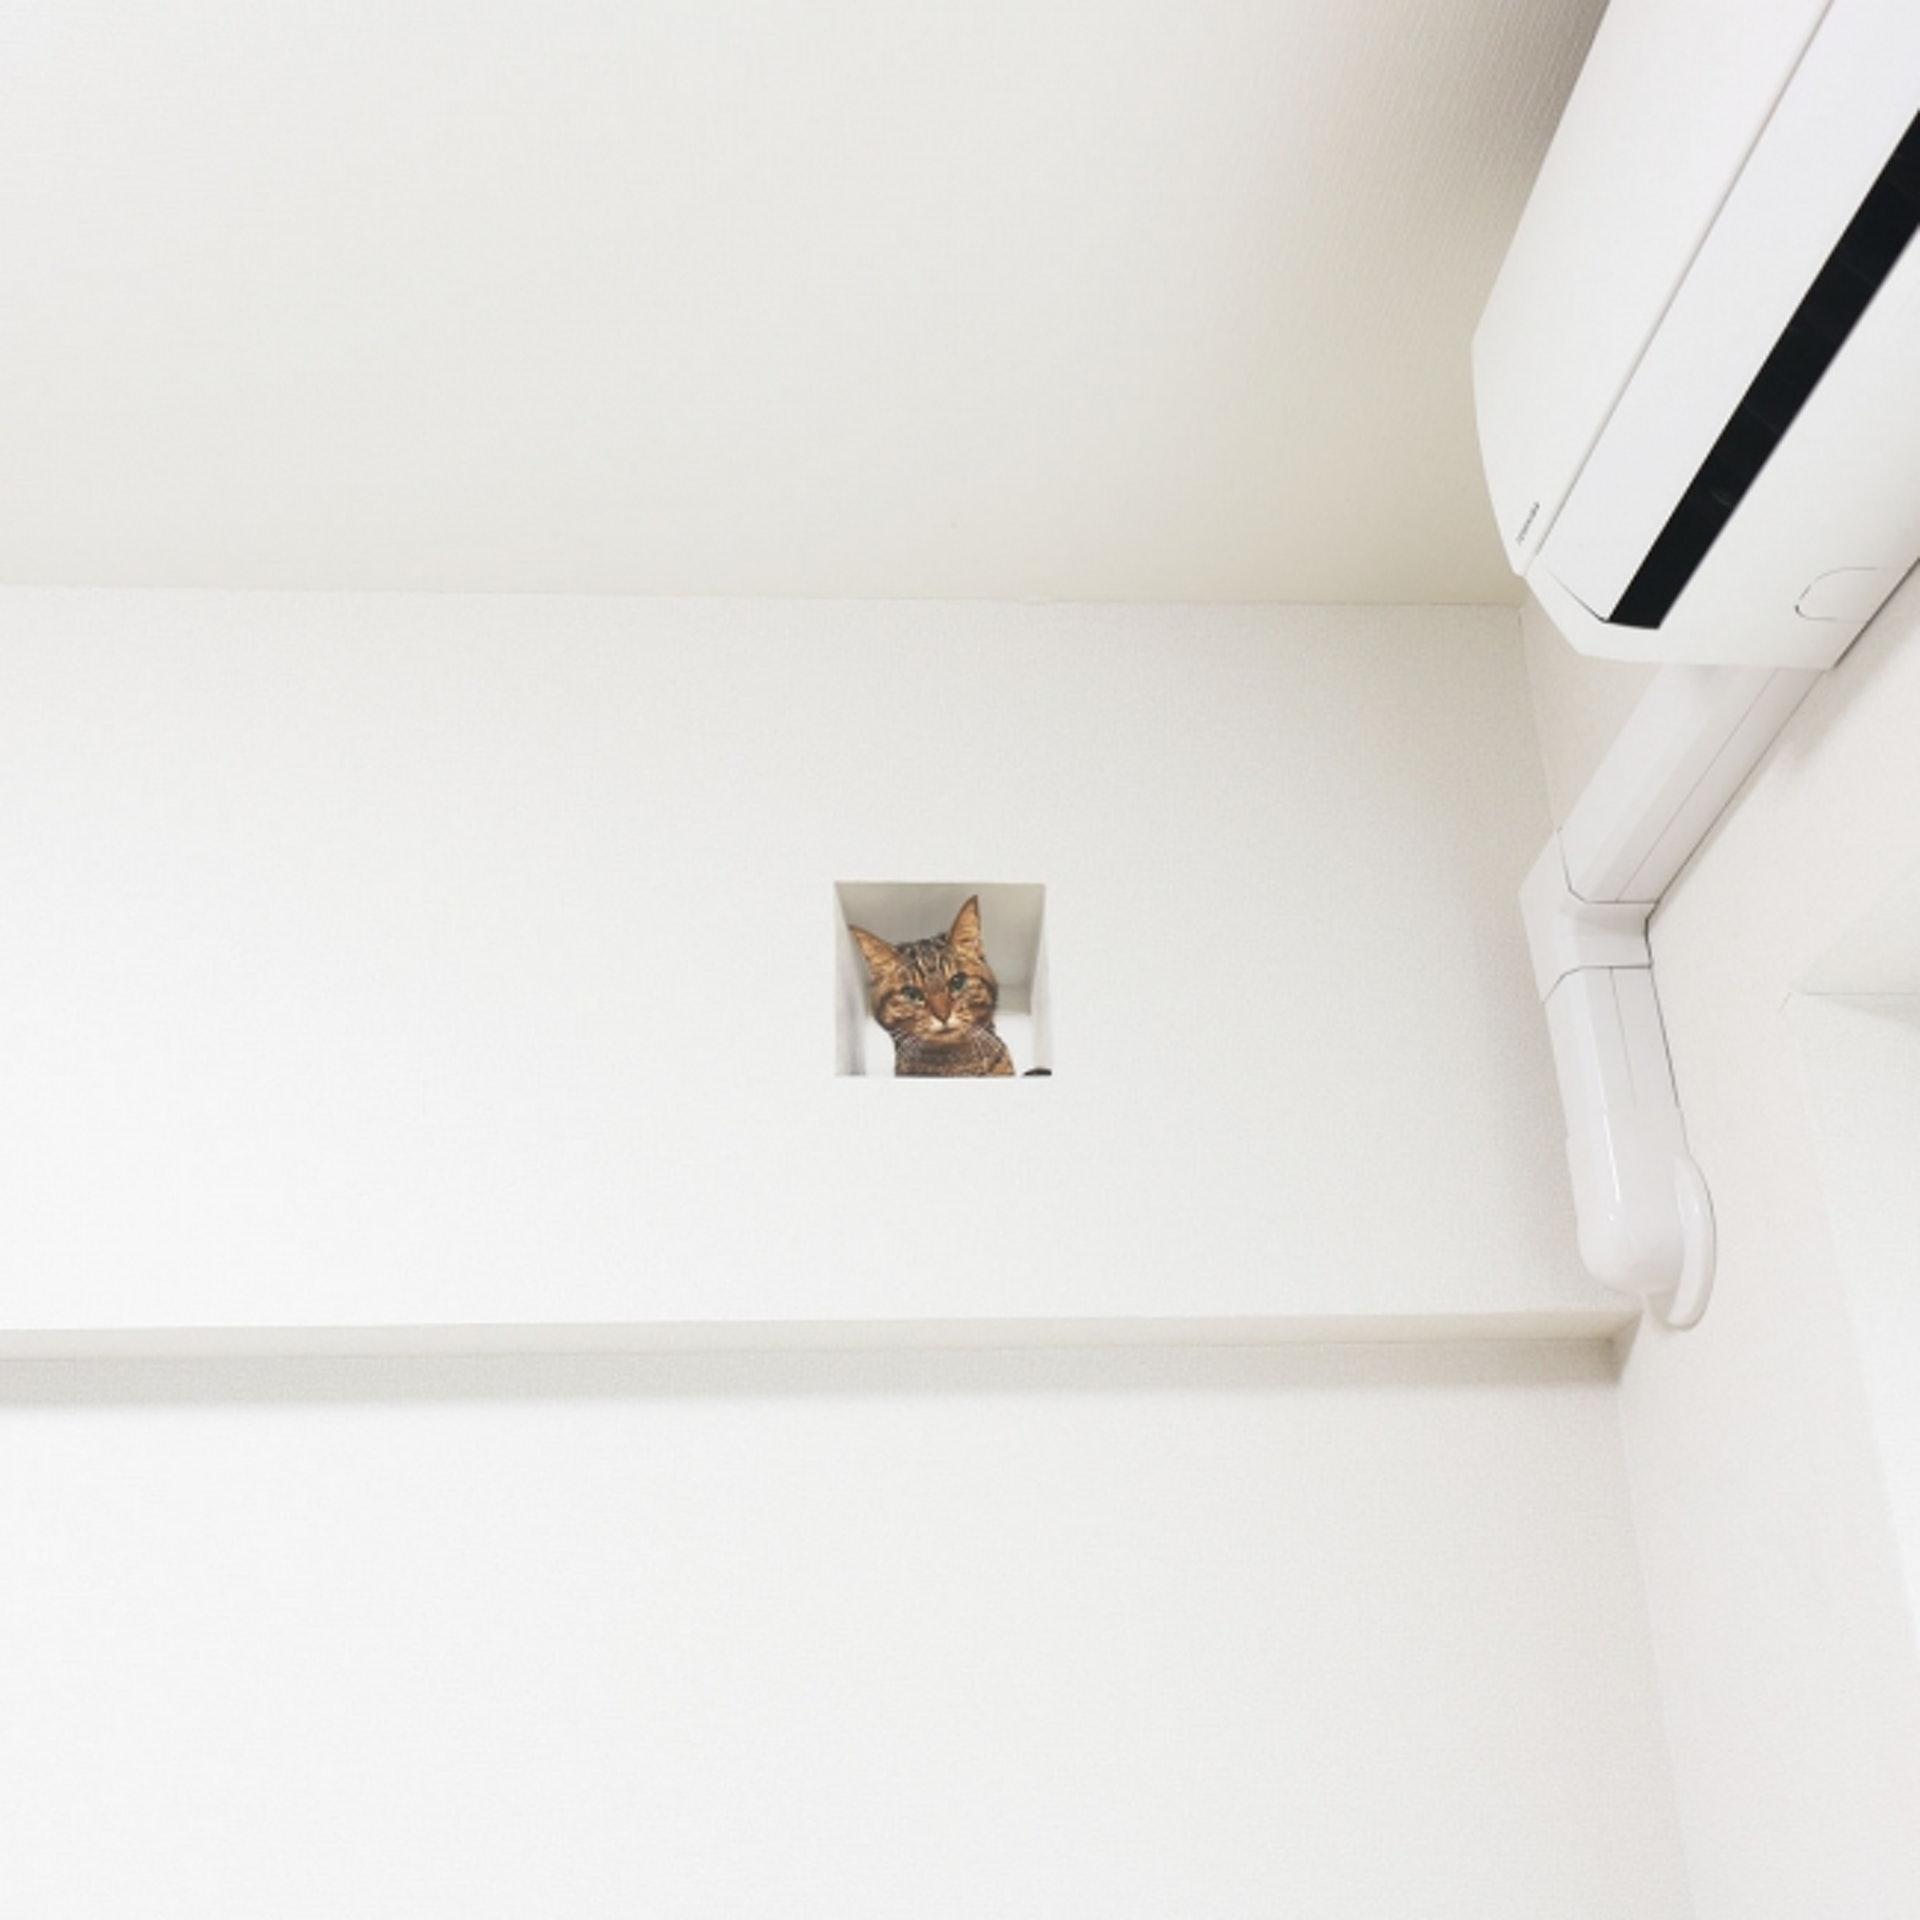 Delusion Mapping貓暗中觀察牆上貼紙:放在近天花位置的牆高,便好似樣。